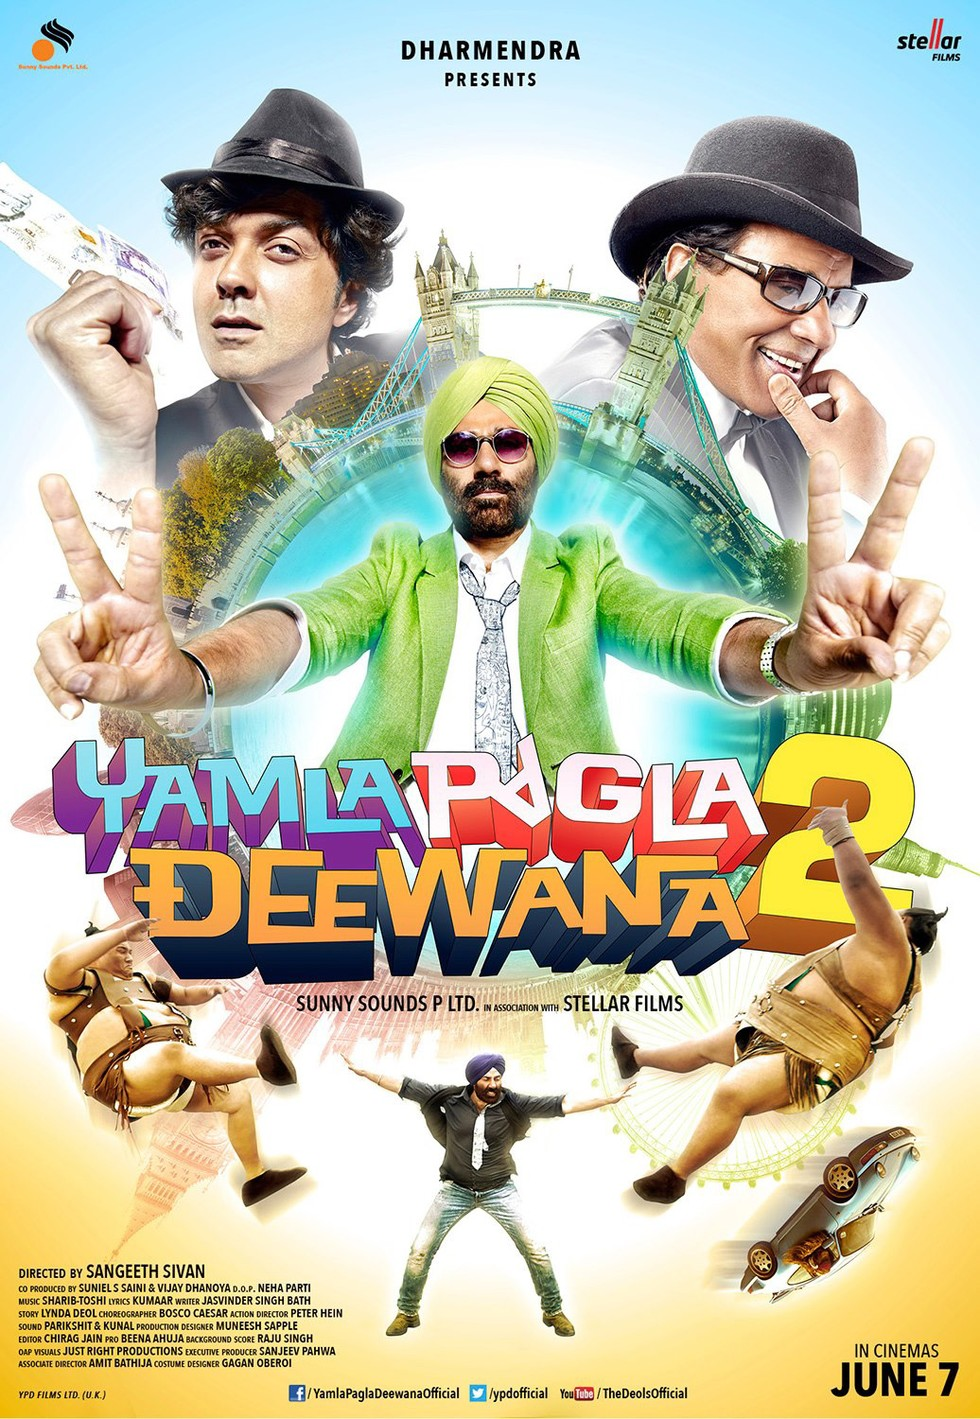 Yamla Pagla Deewana 2 - Movie Poster #9 (Large)